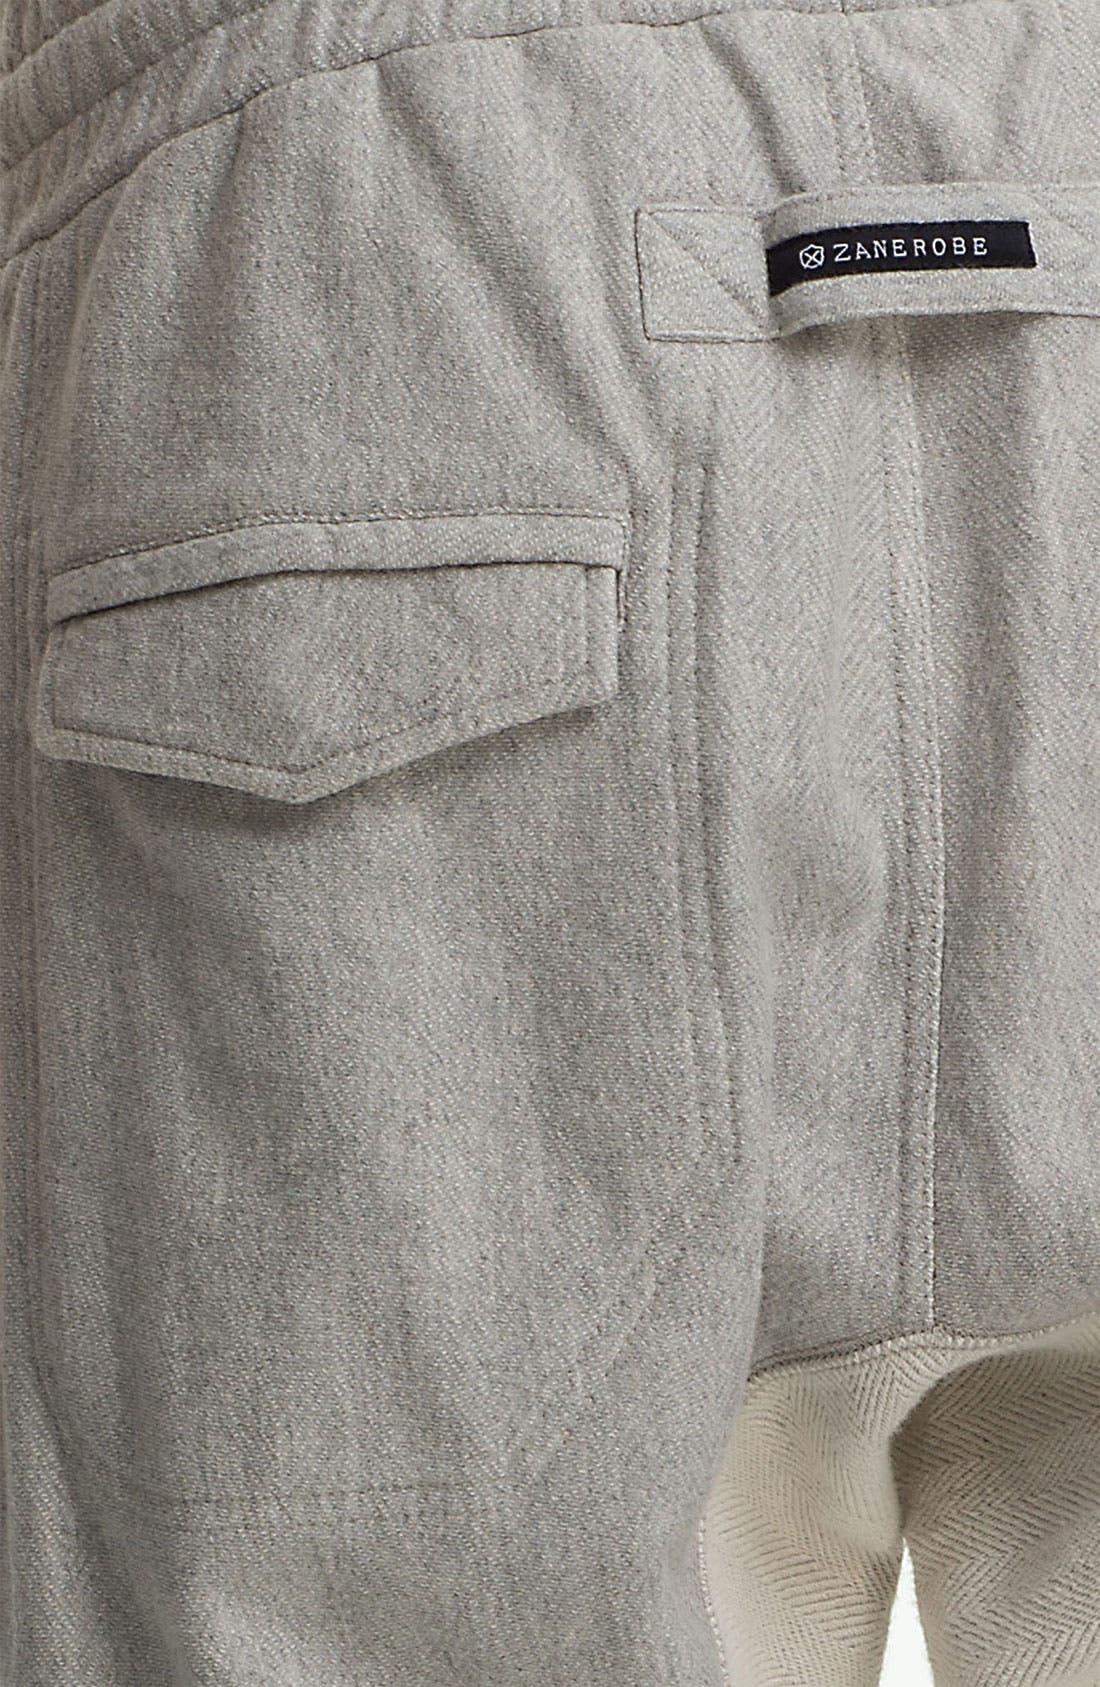 ZANEROBE, 'Slapshot' Sweatpants, Alternate thumbnail 2, color, 050